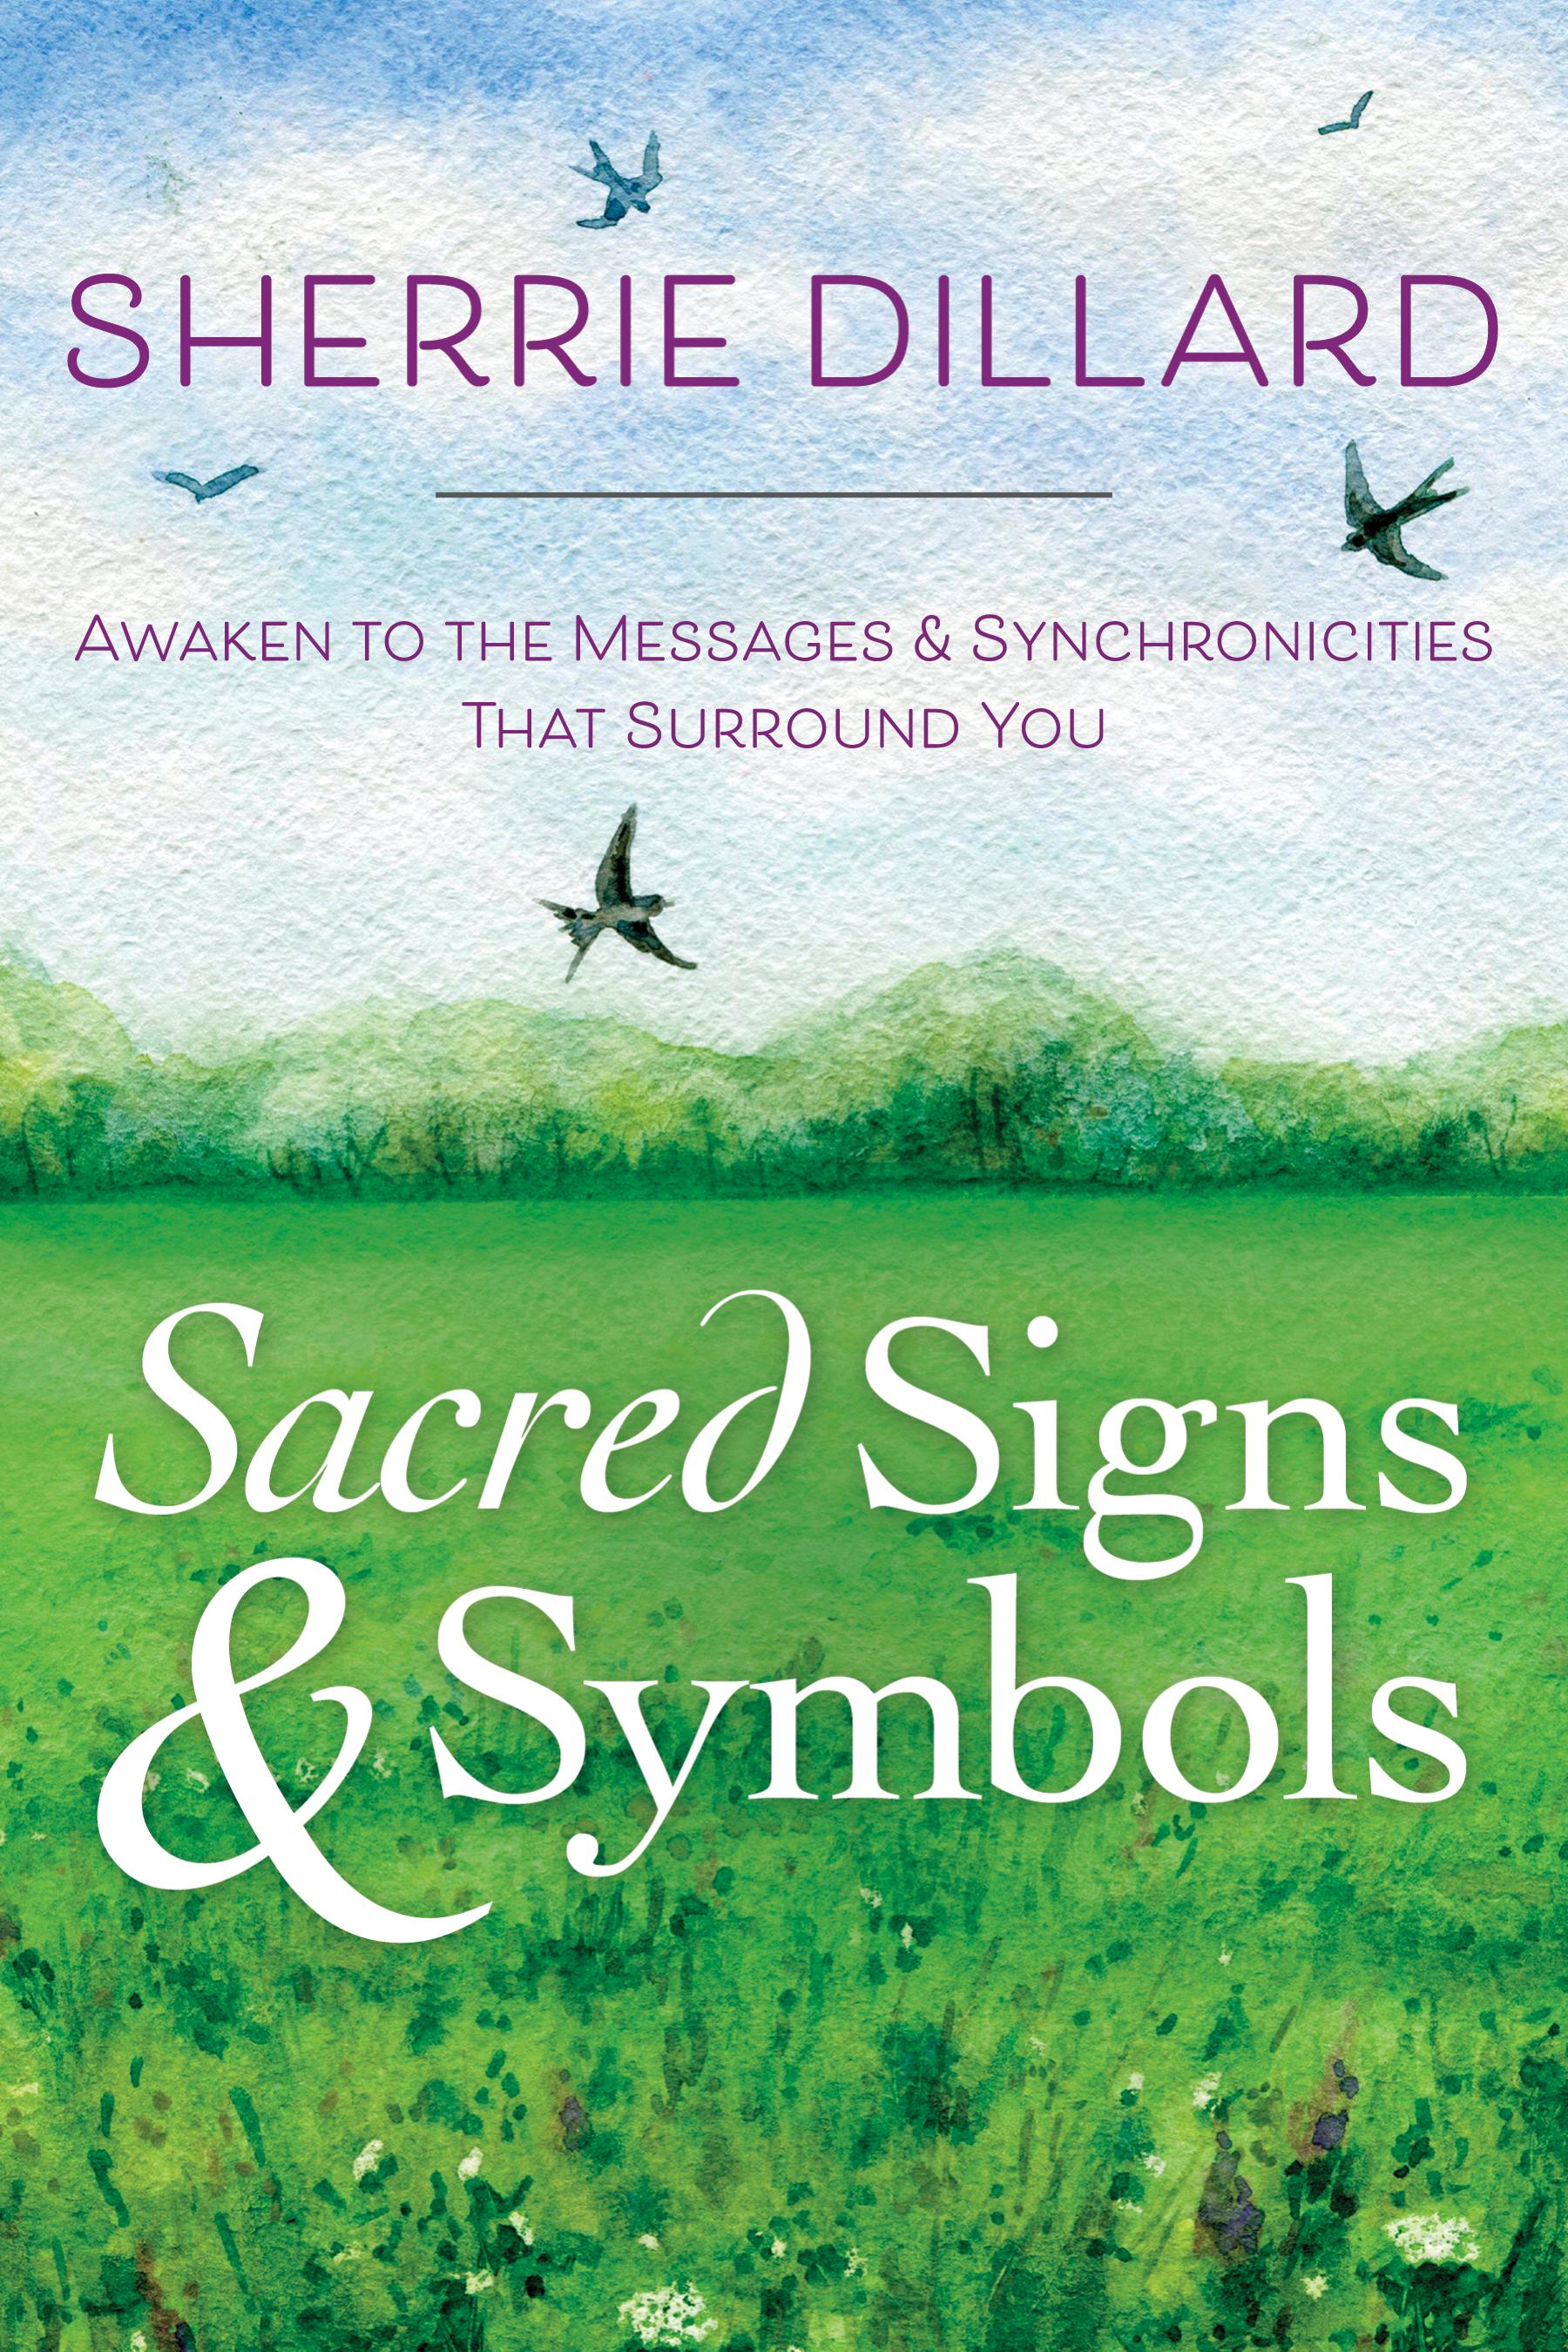 Sacred Signs and Symbols.jpg